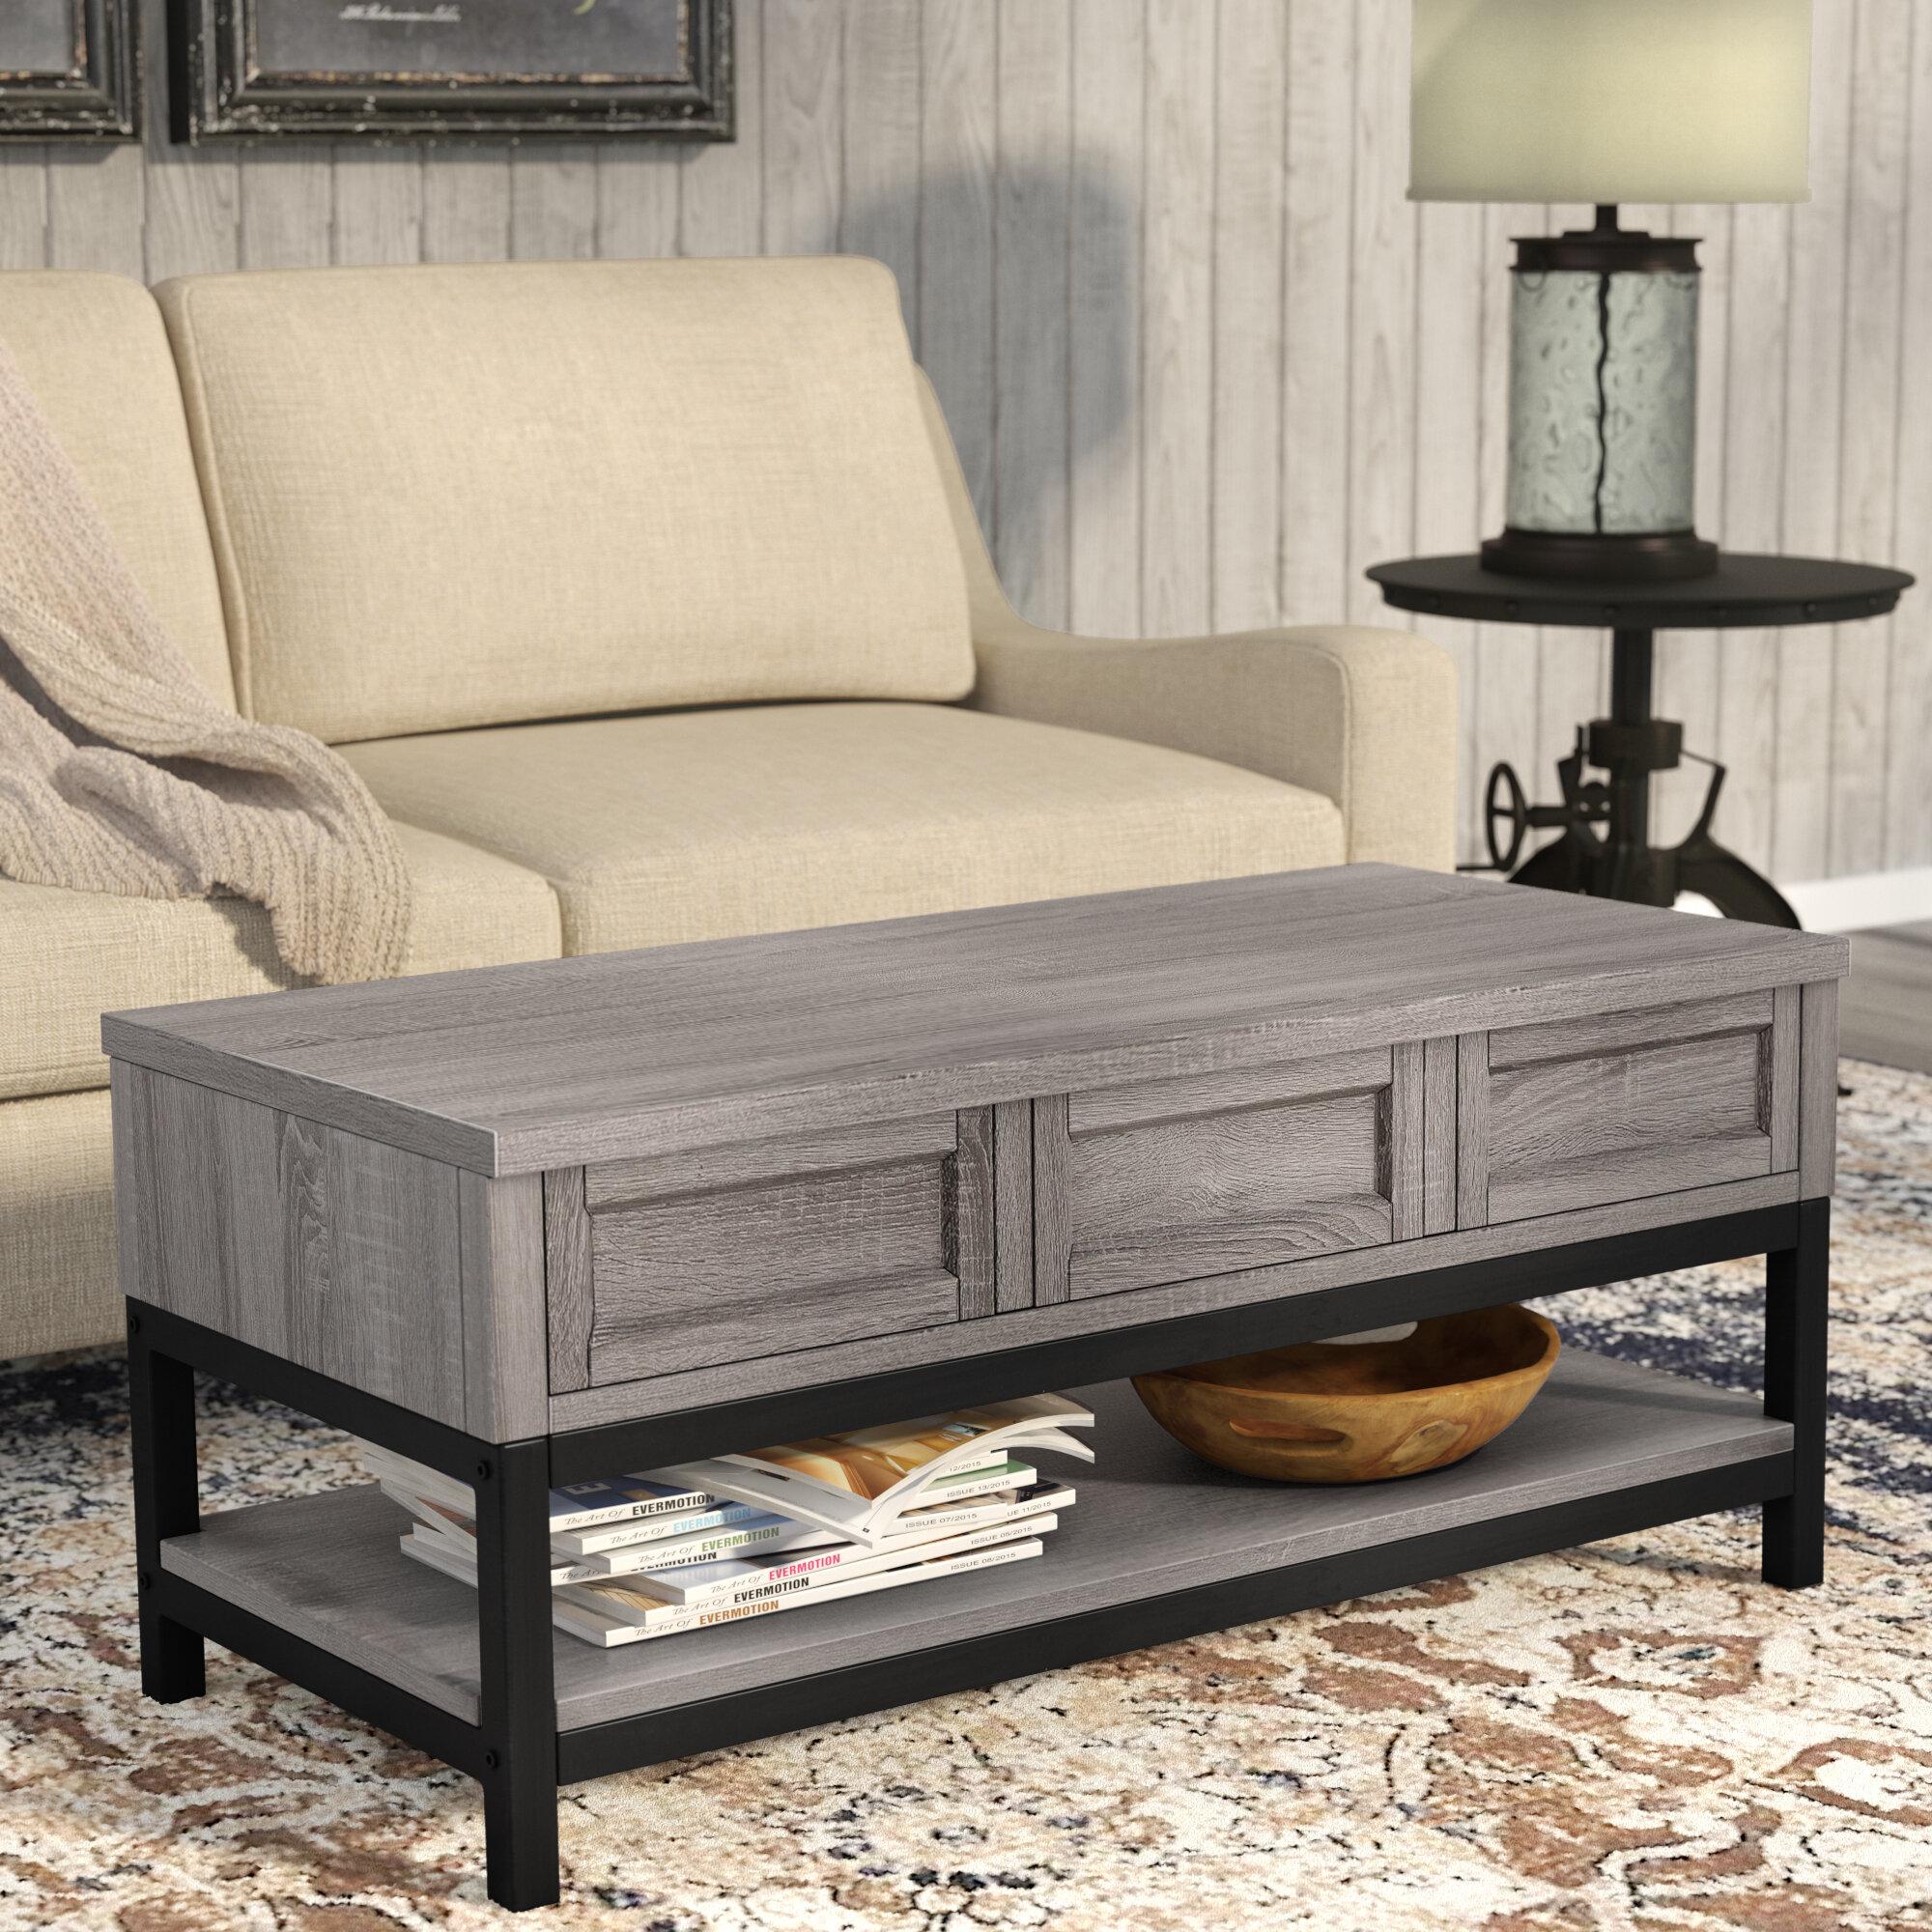 Prime Omar Lift Top Coffee Table Lamtechconsult Wood Chair Design Ideas Lamtechconsultcom